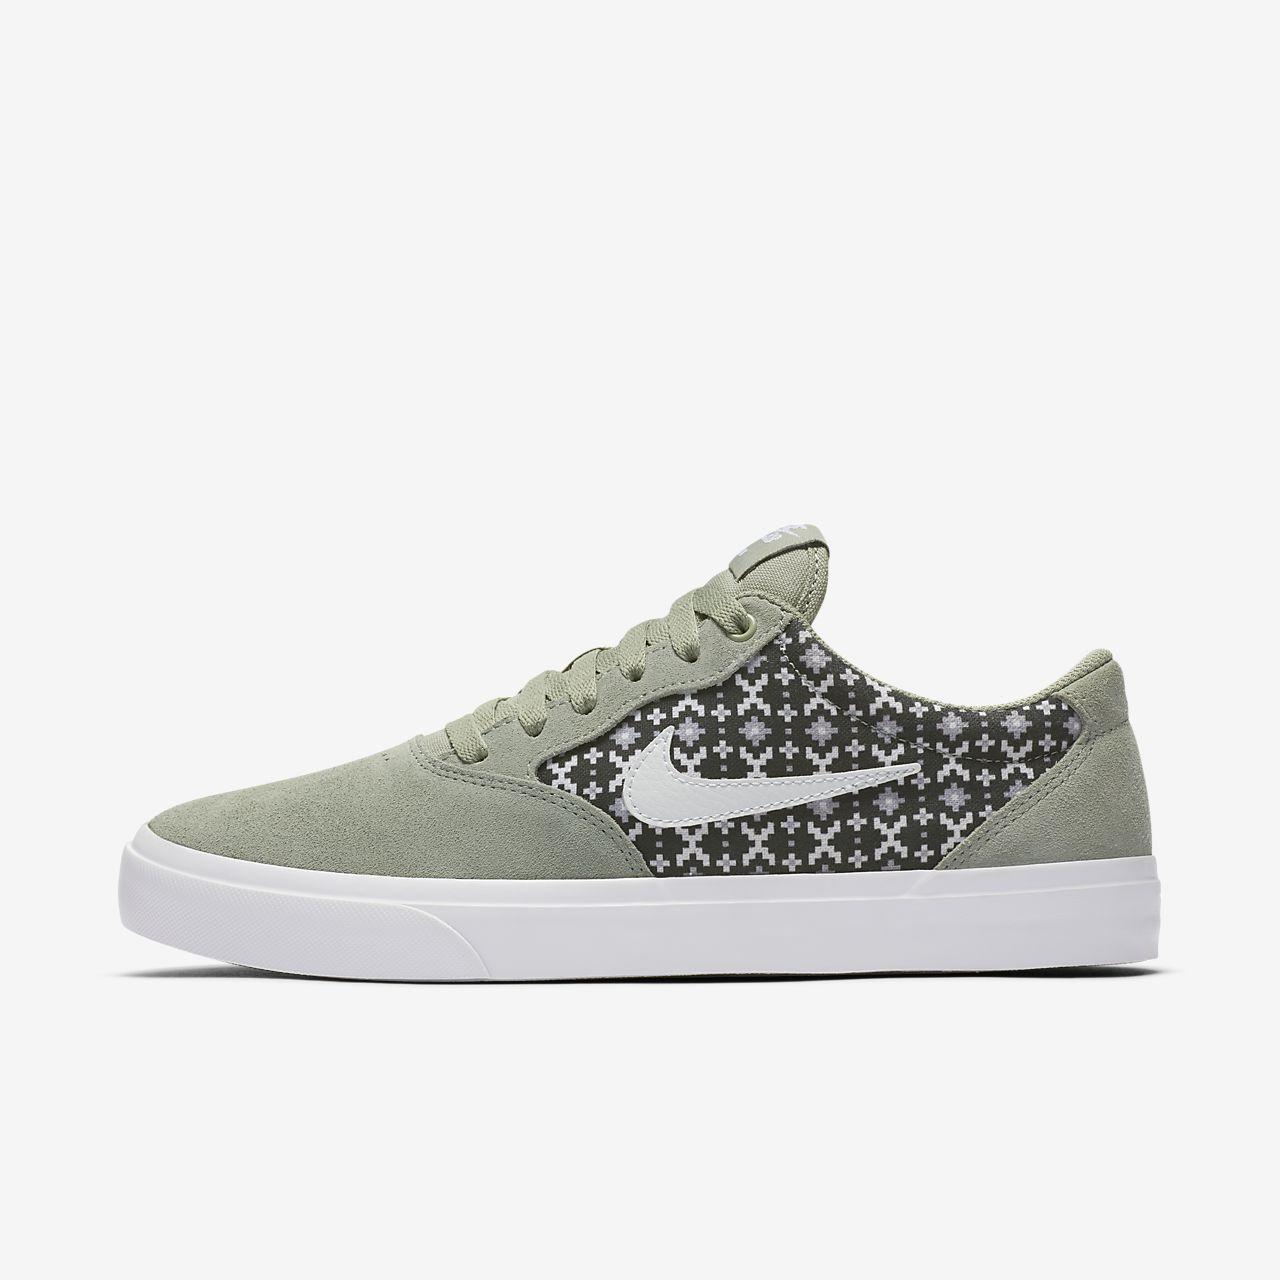 Nike SB Chron Solarsoft Premium Skate Shoe